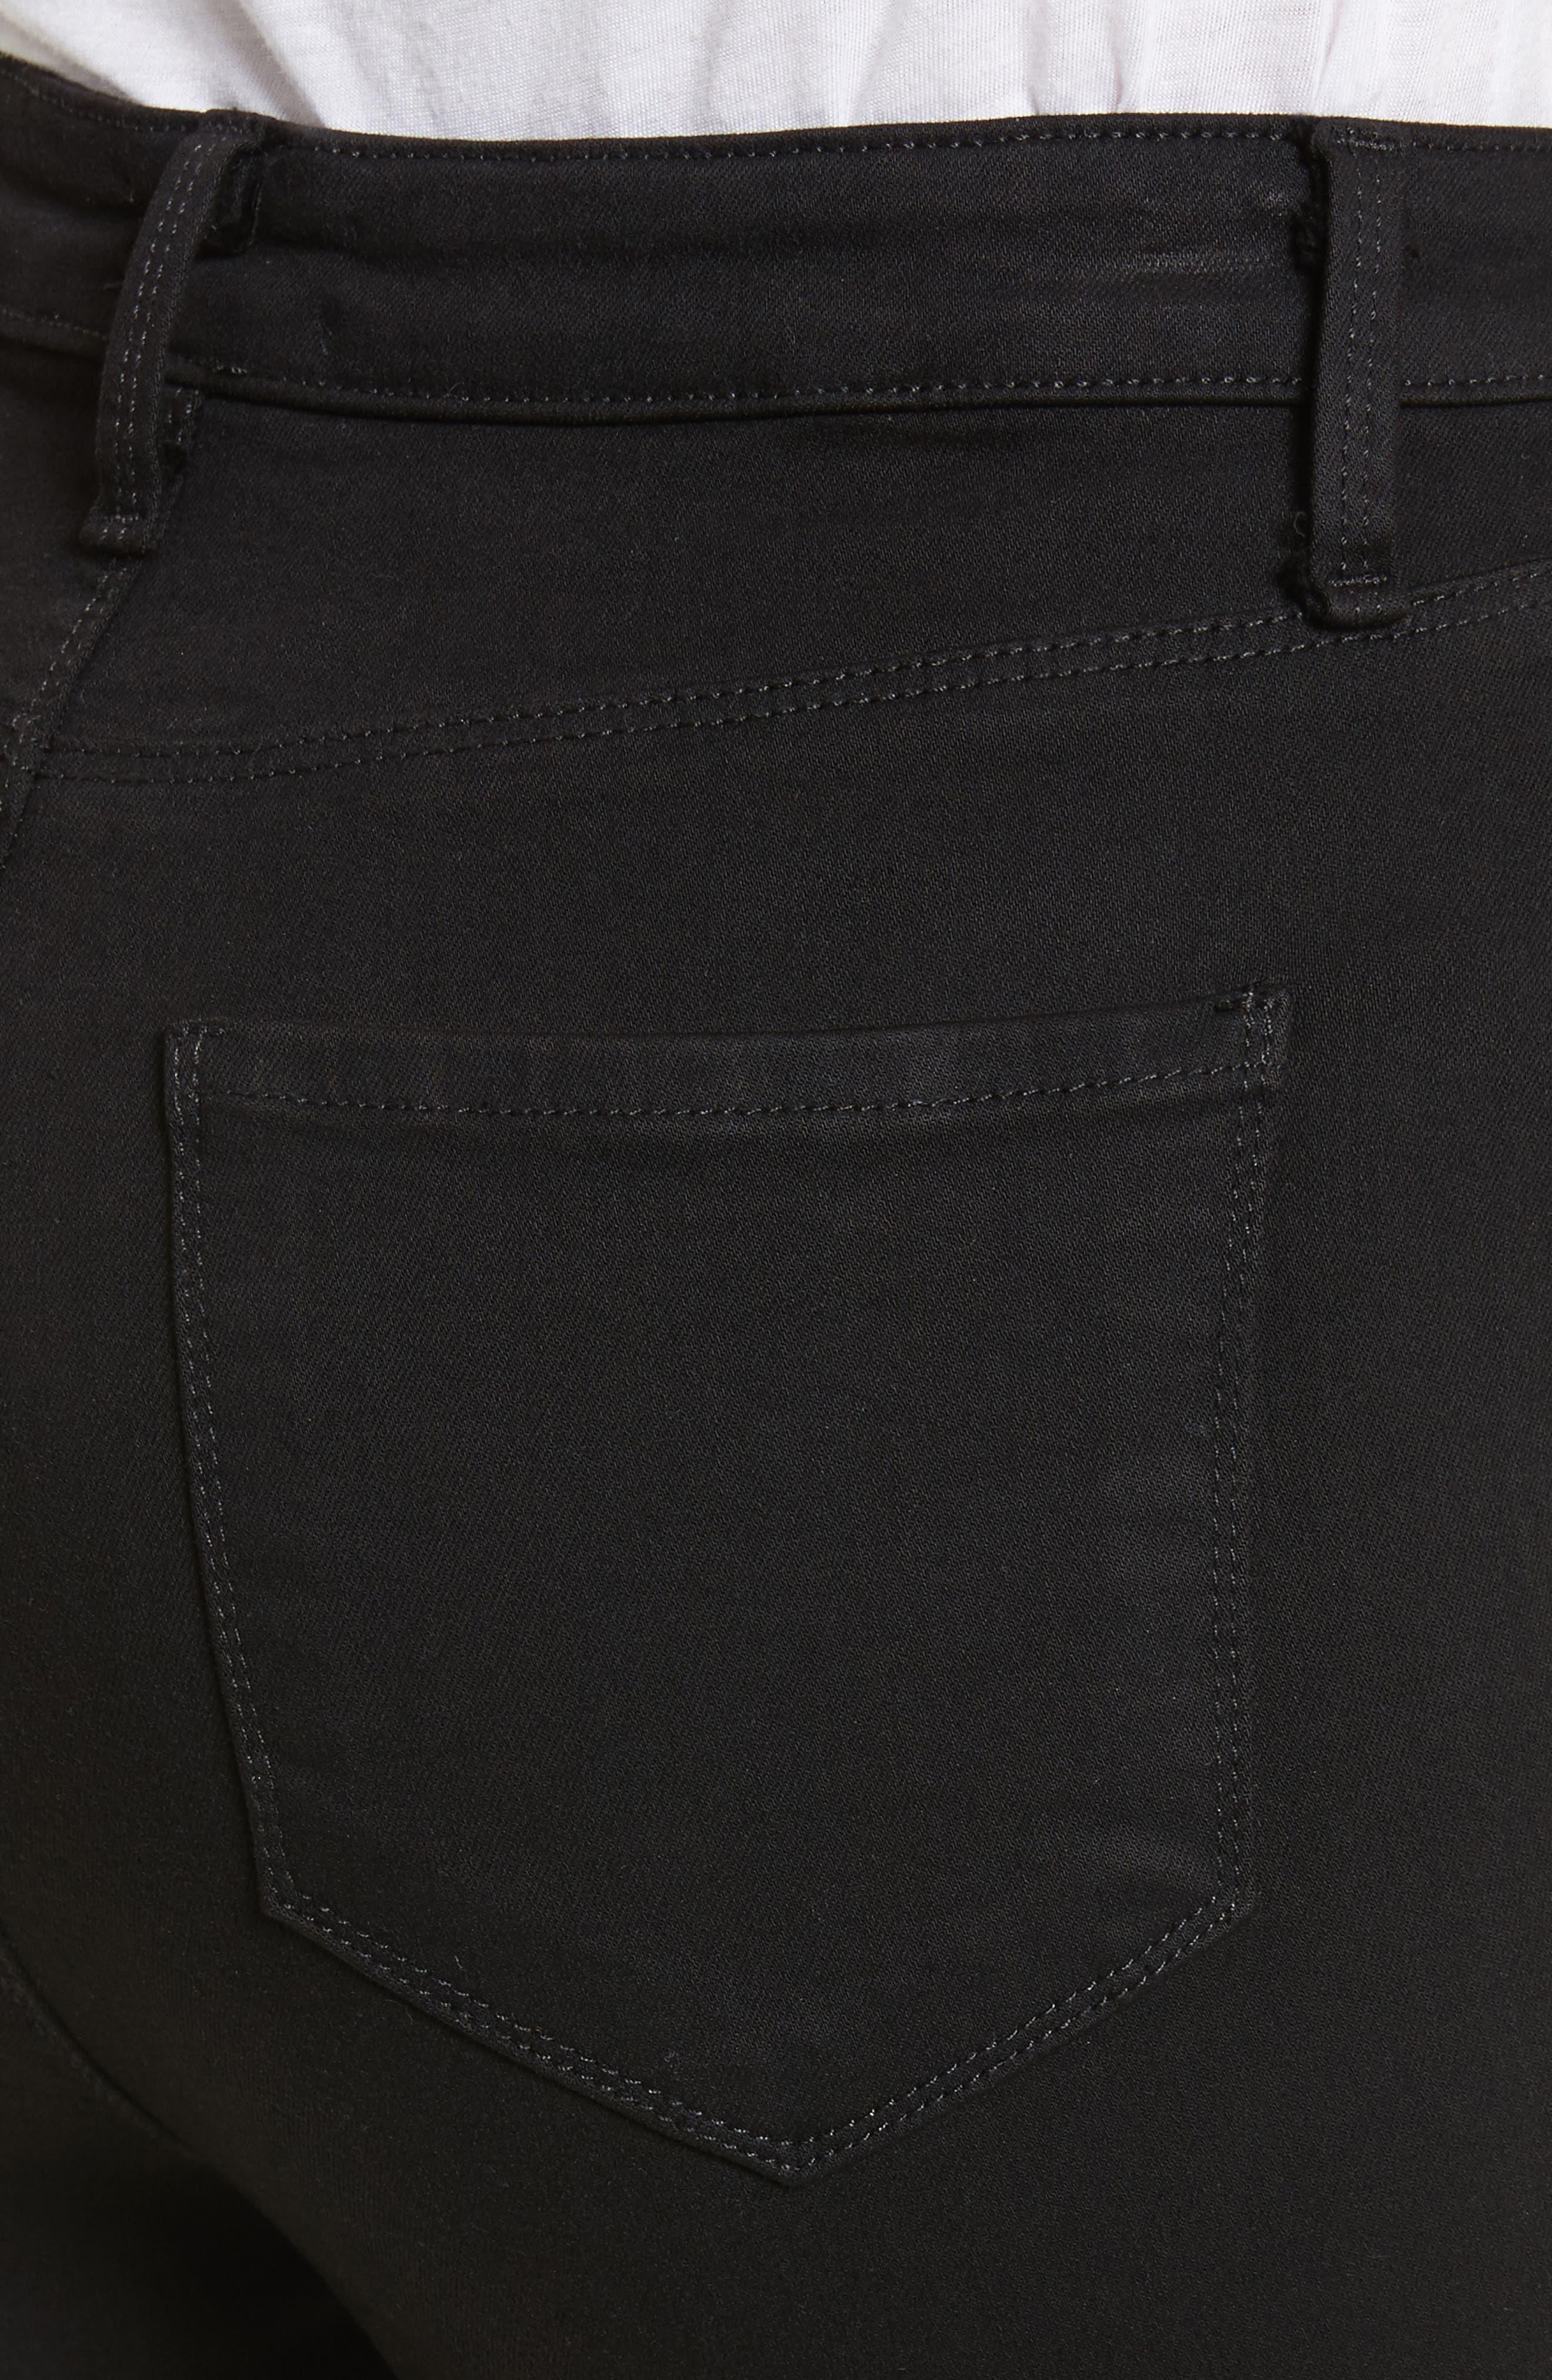 Katrina Ultra High Waist Skinny Jeans,                             Alternate thumbnail 4, color,                             Noir